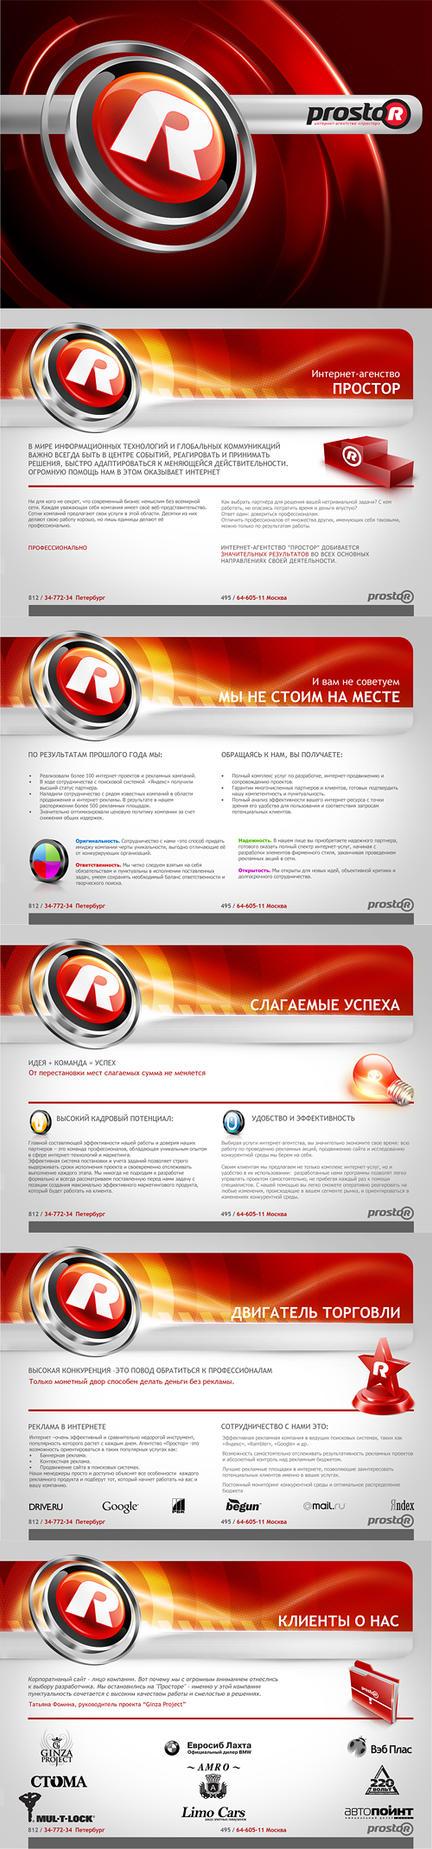 Prostor_presentation by TIT0